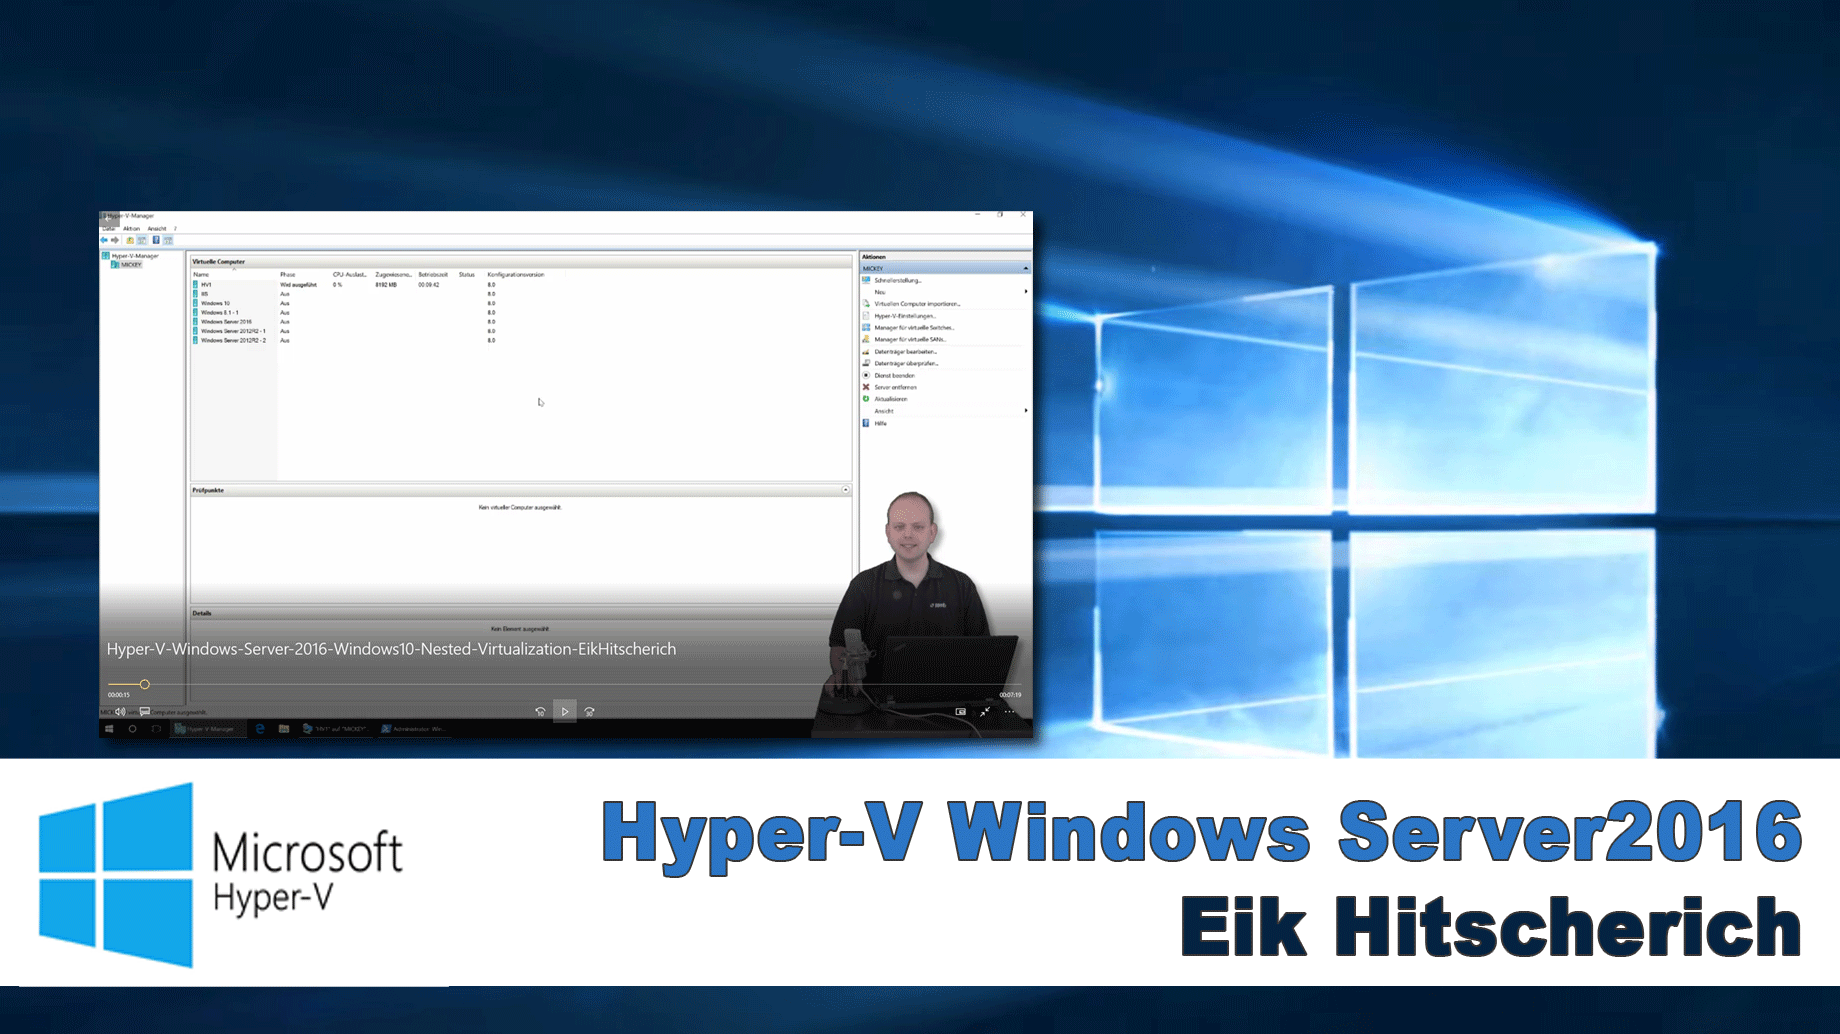 2017/Trainer/Hyper-V-Windows-Server-2016-Windows10-Nested-Virtualization-EikHitscherich